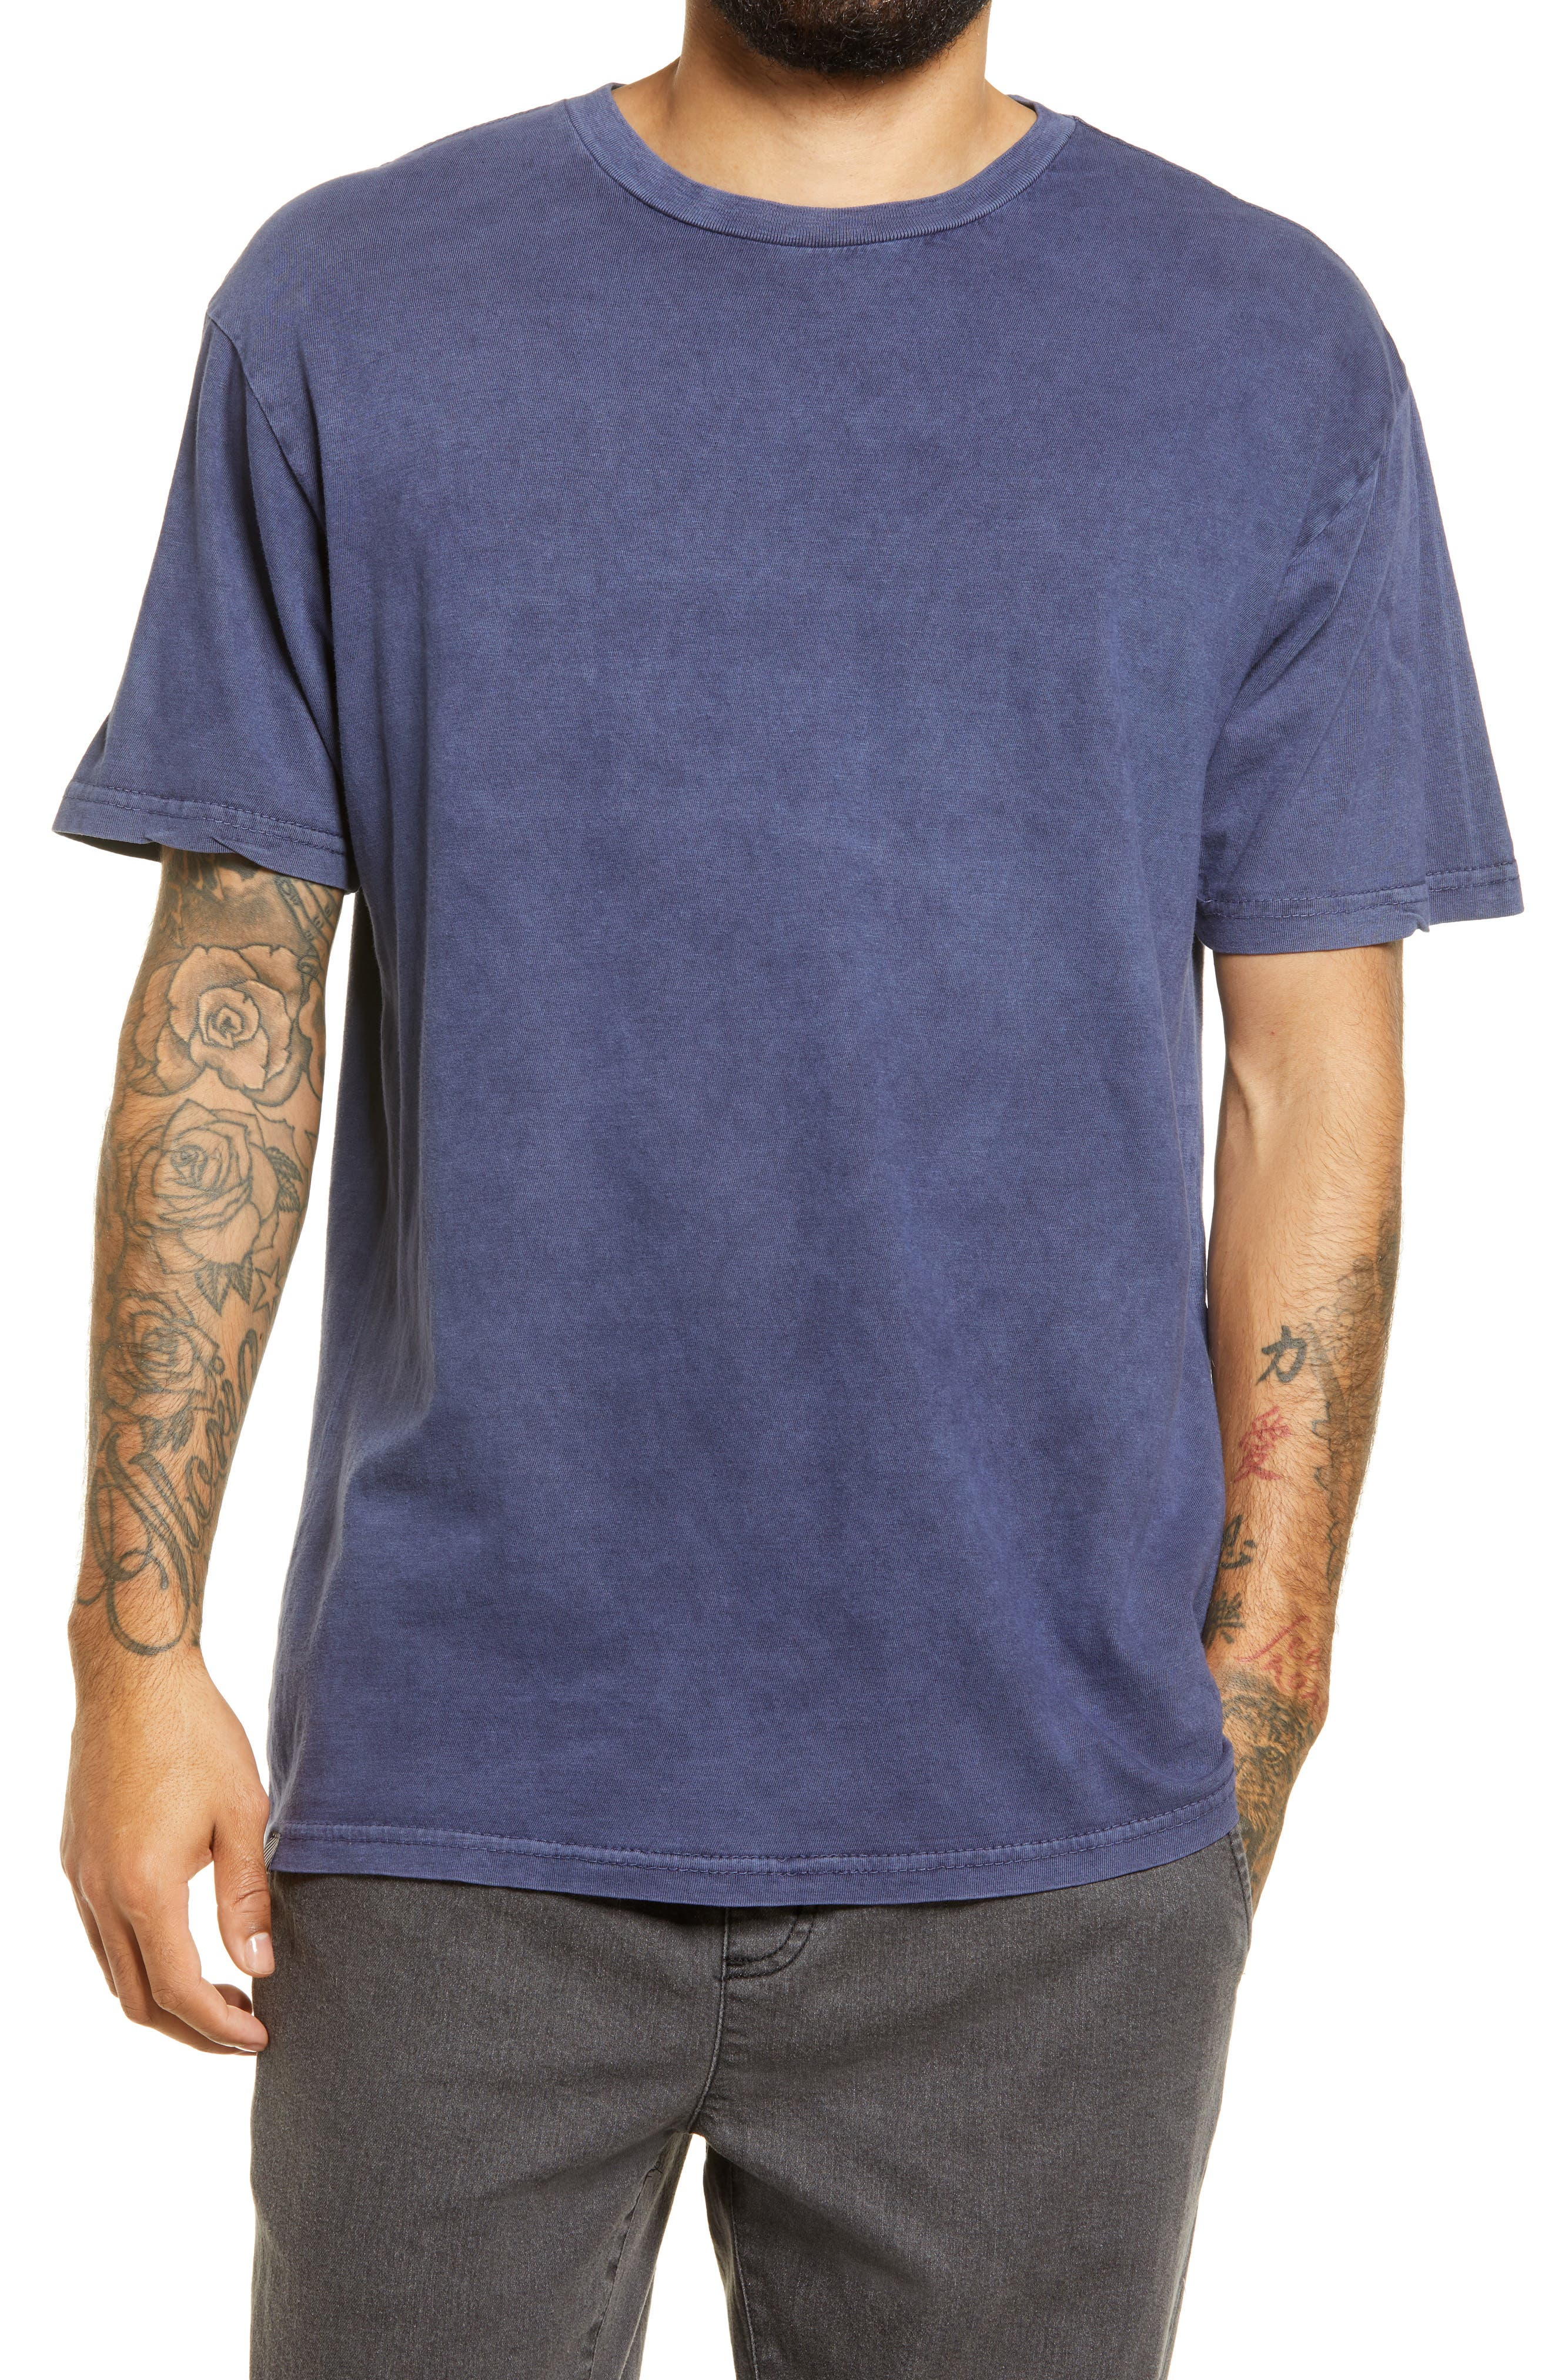 Vintage Wash Unisex T-Shirt